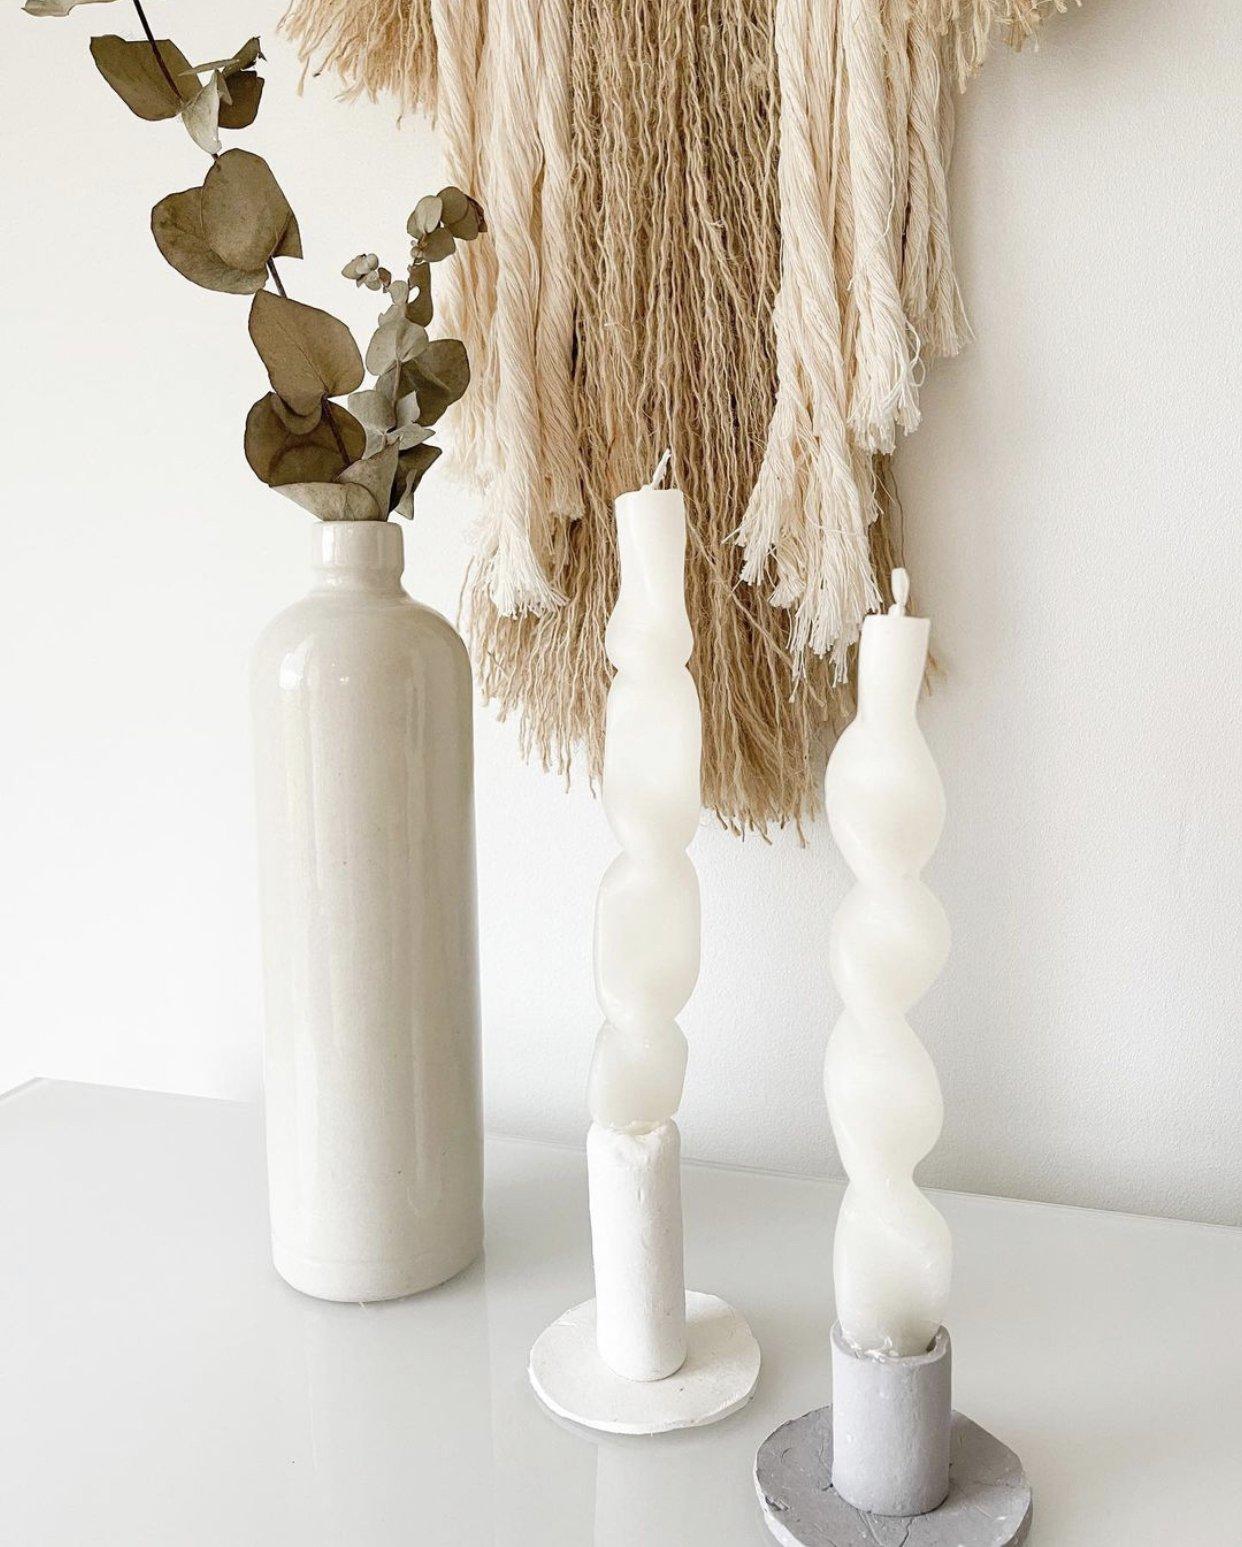 bougie-torsadé-tendance-decoration